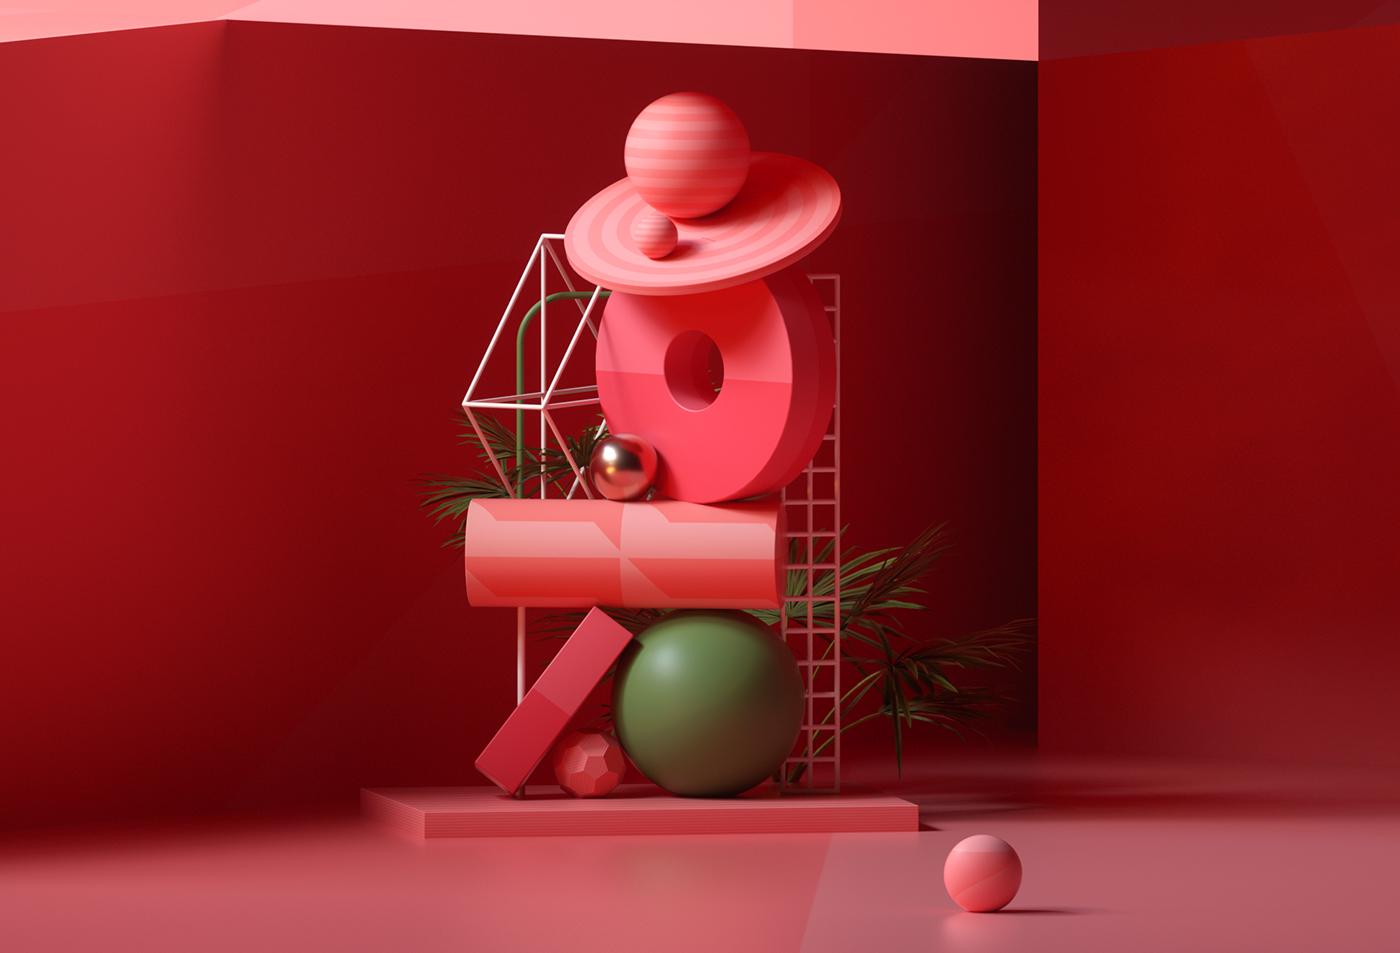 photo design Minimalism 3D architecture mirror c4d colorful